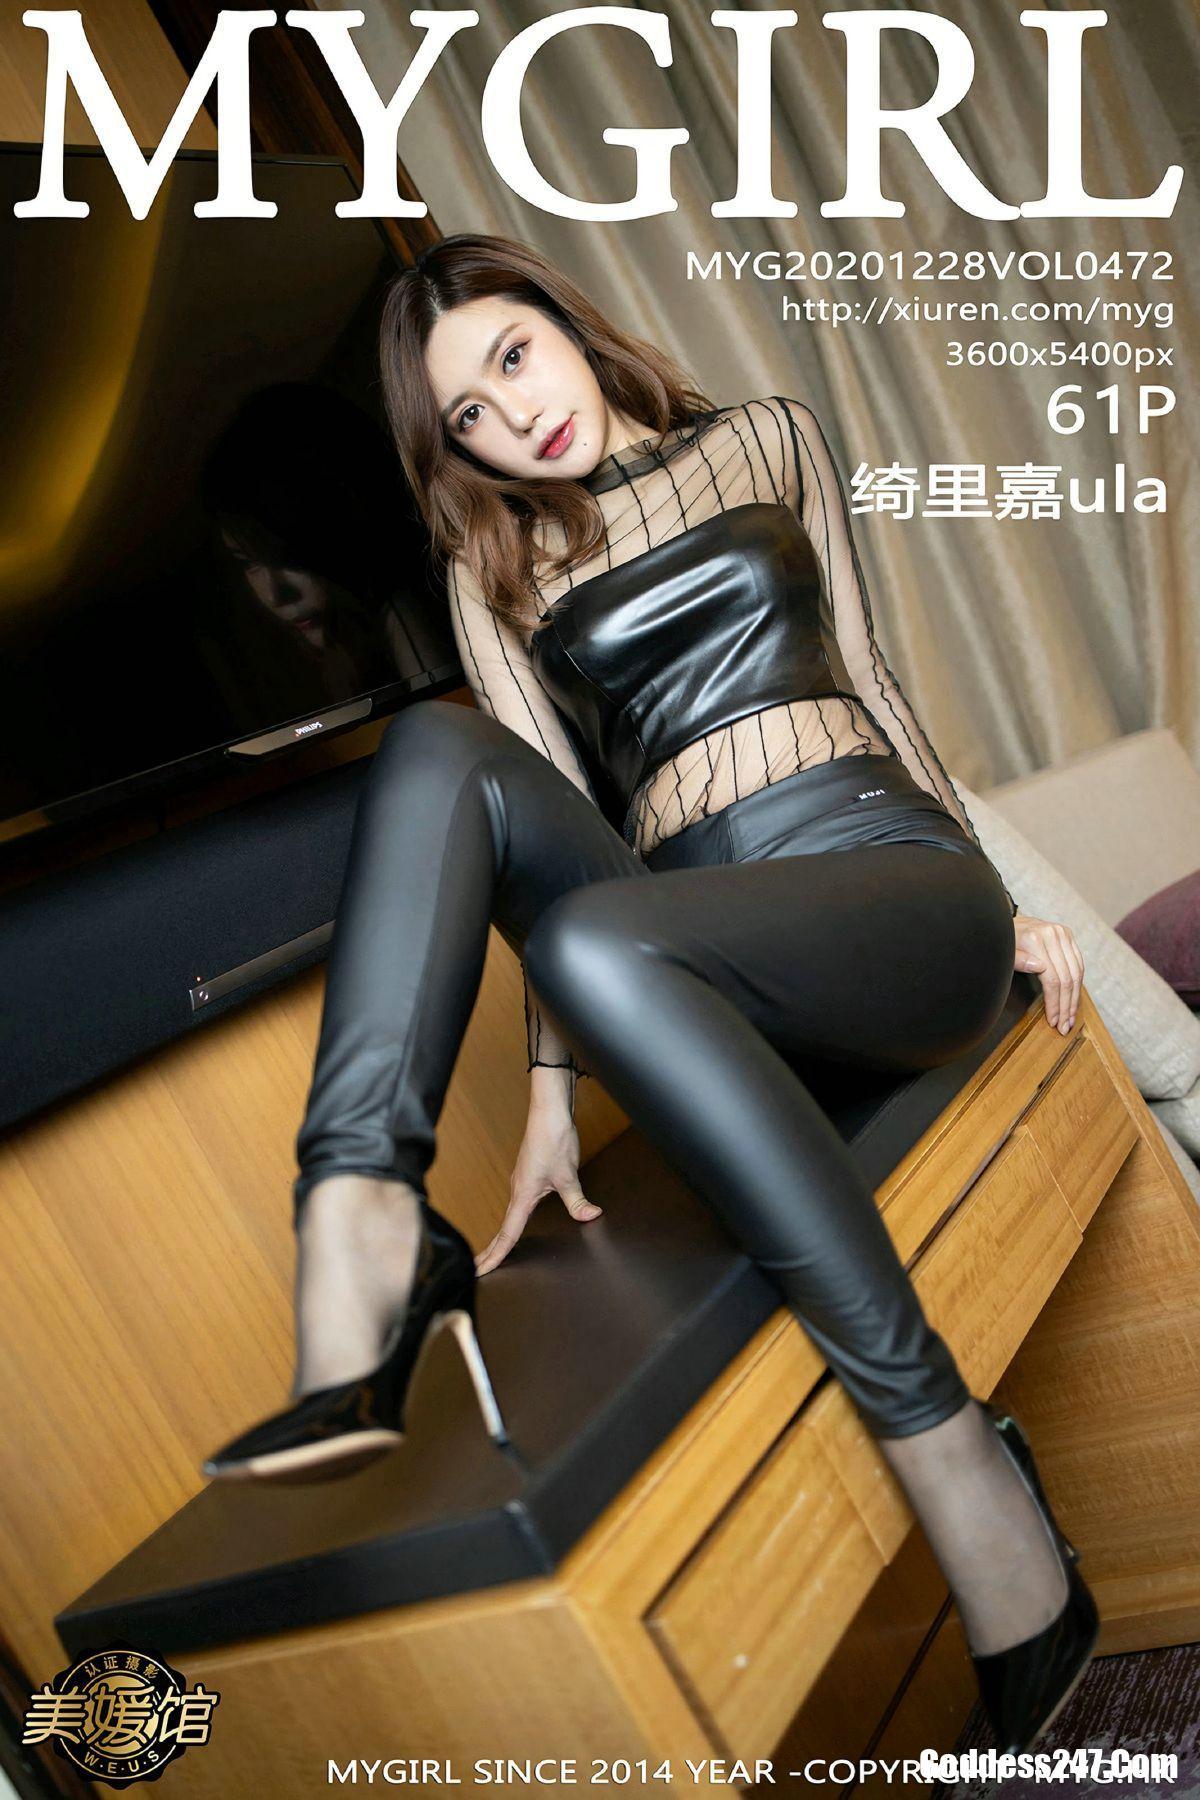 MyGirl美媛馆 Vol.472 绮里嘉ula